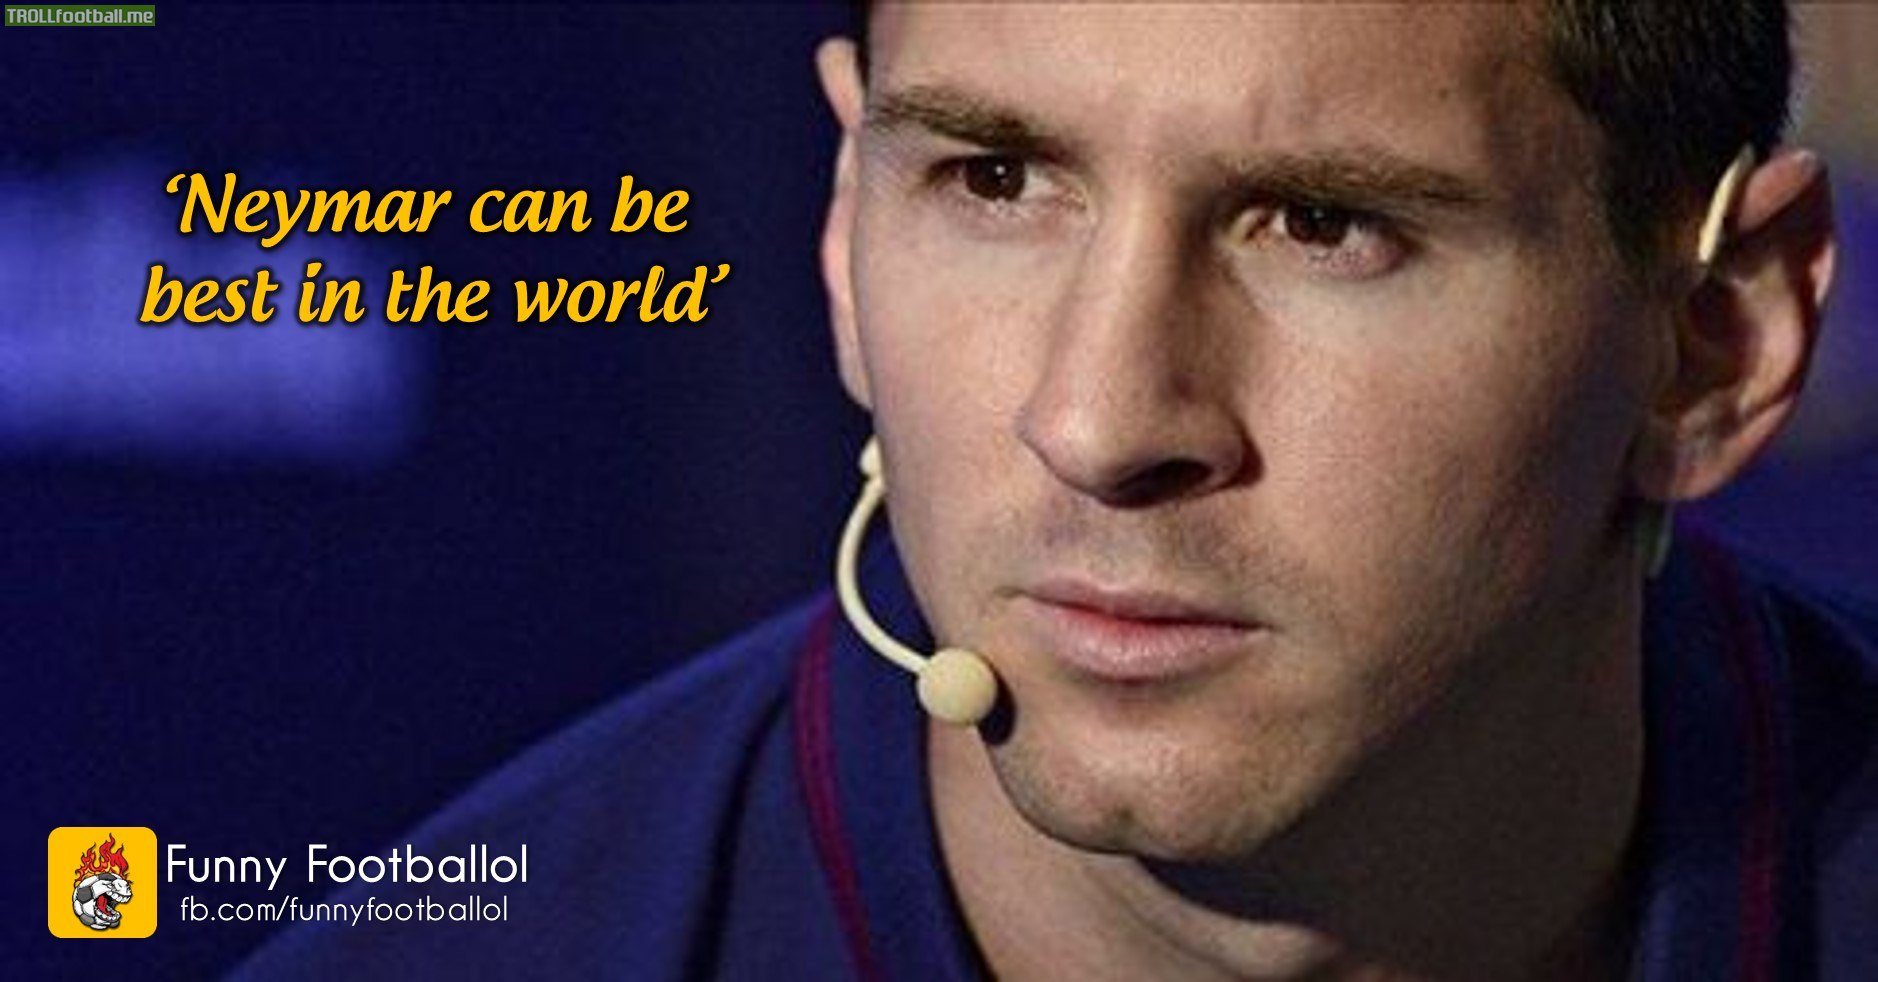 Messi on Neymar